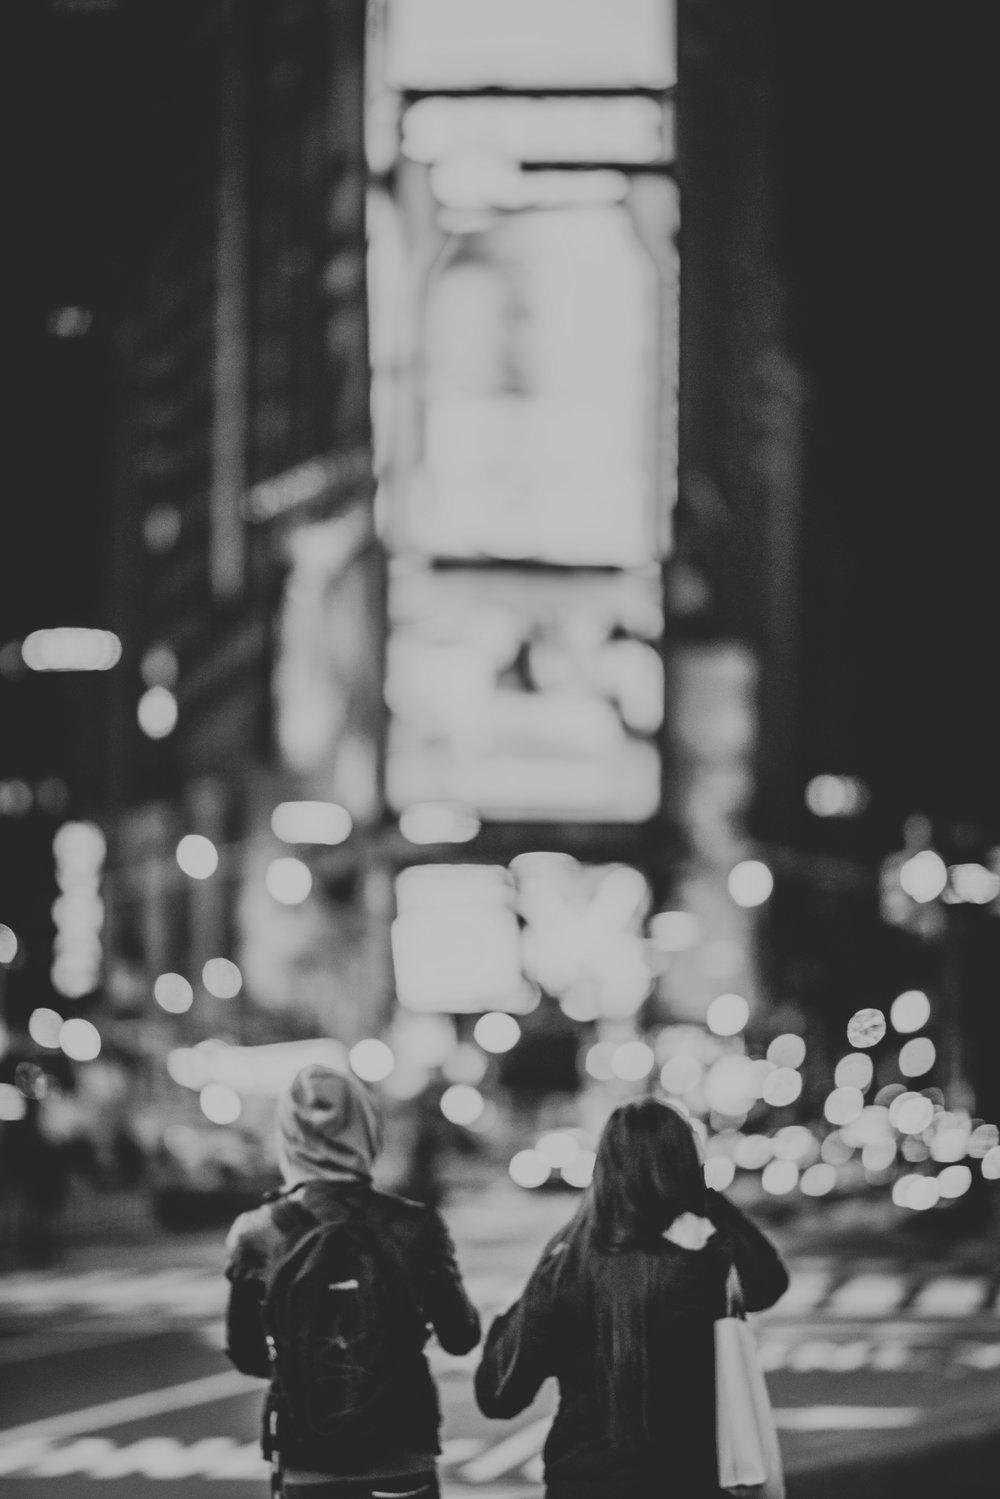 NYC_135 (6).JPG